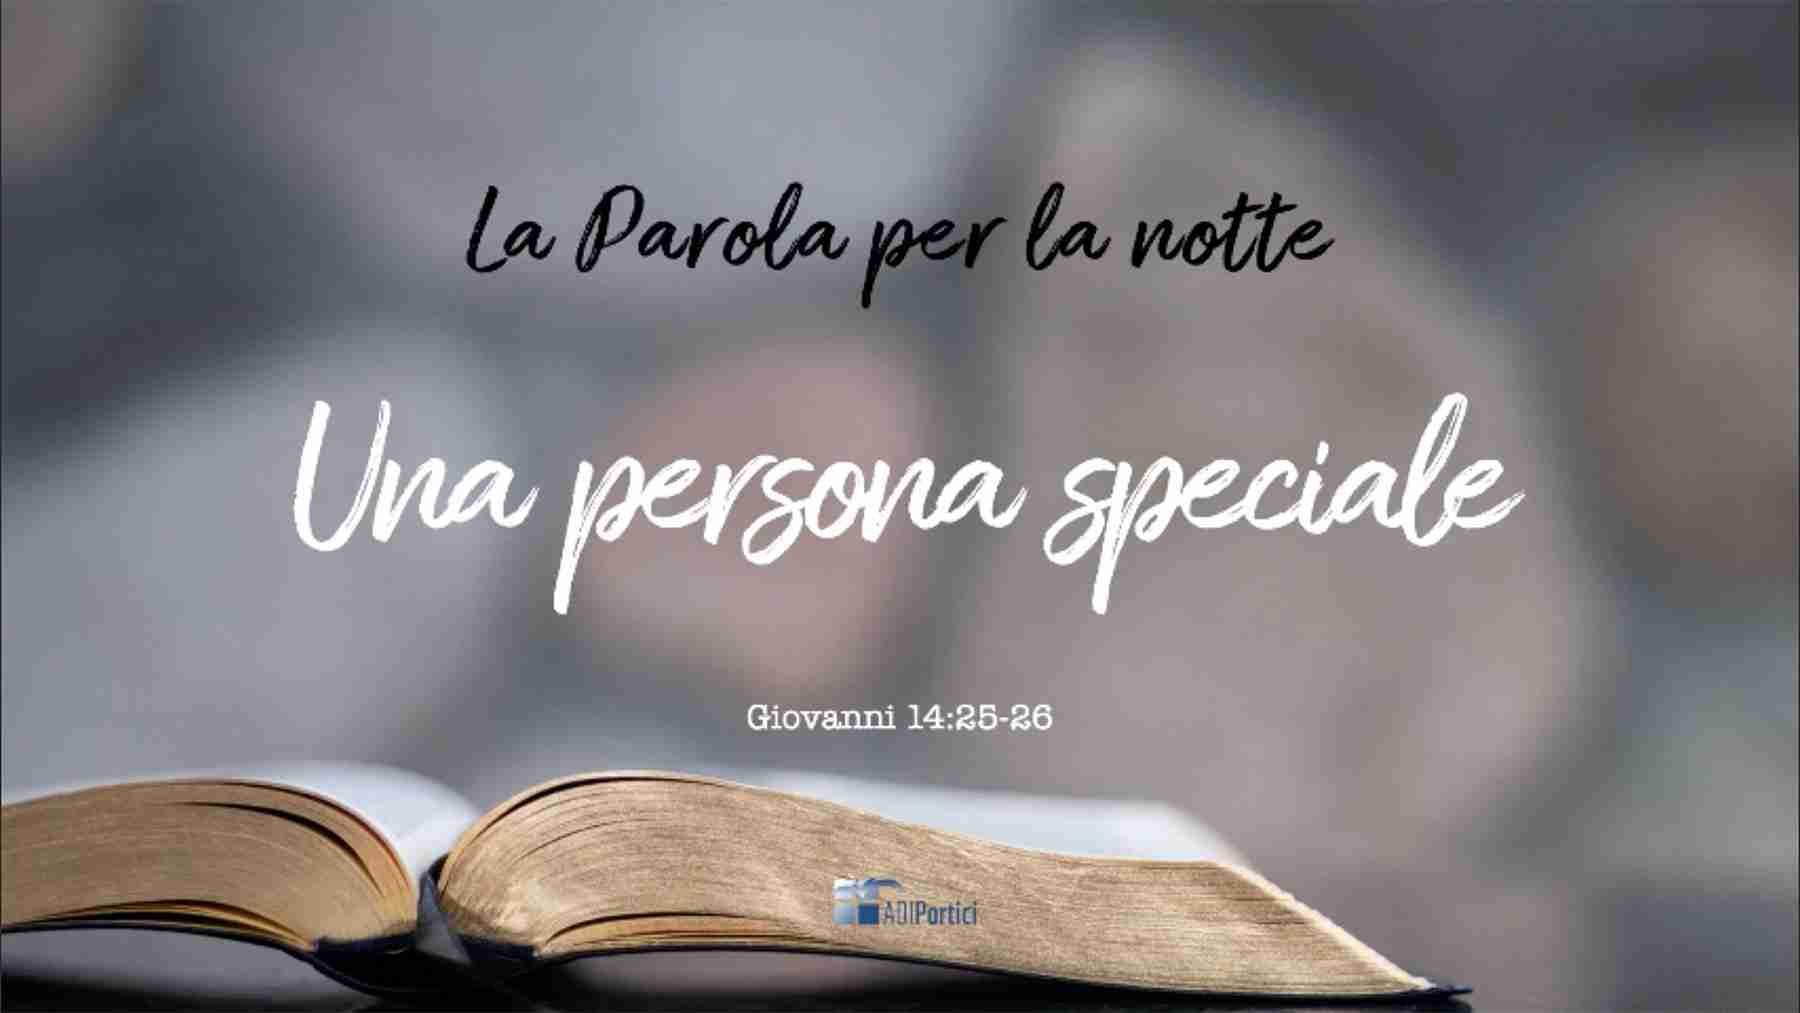 11. Una Persona speciale